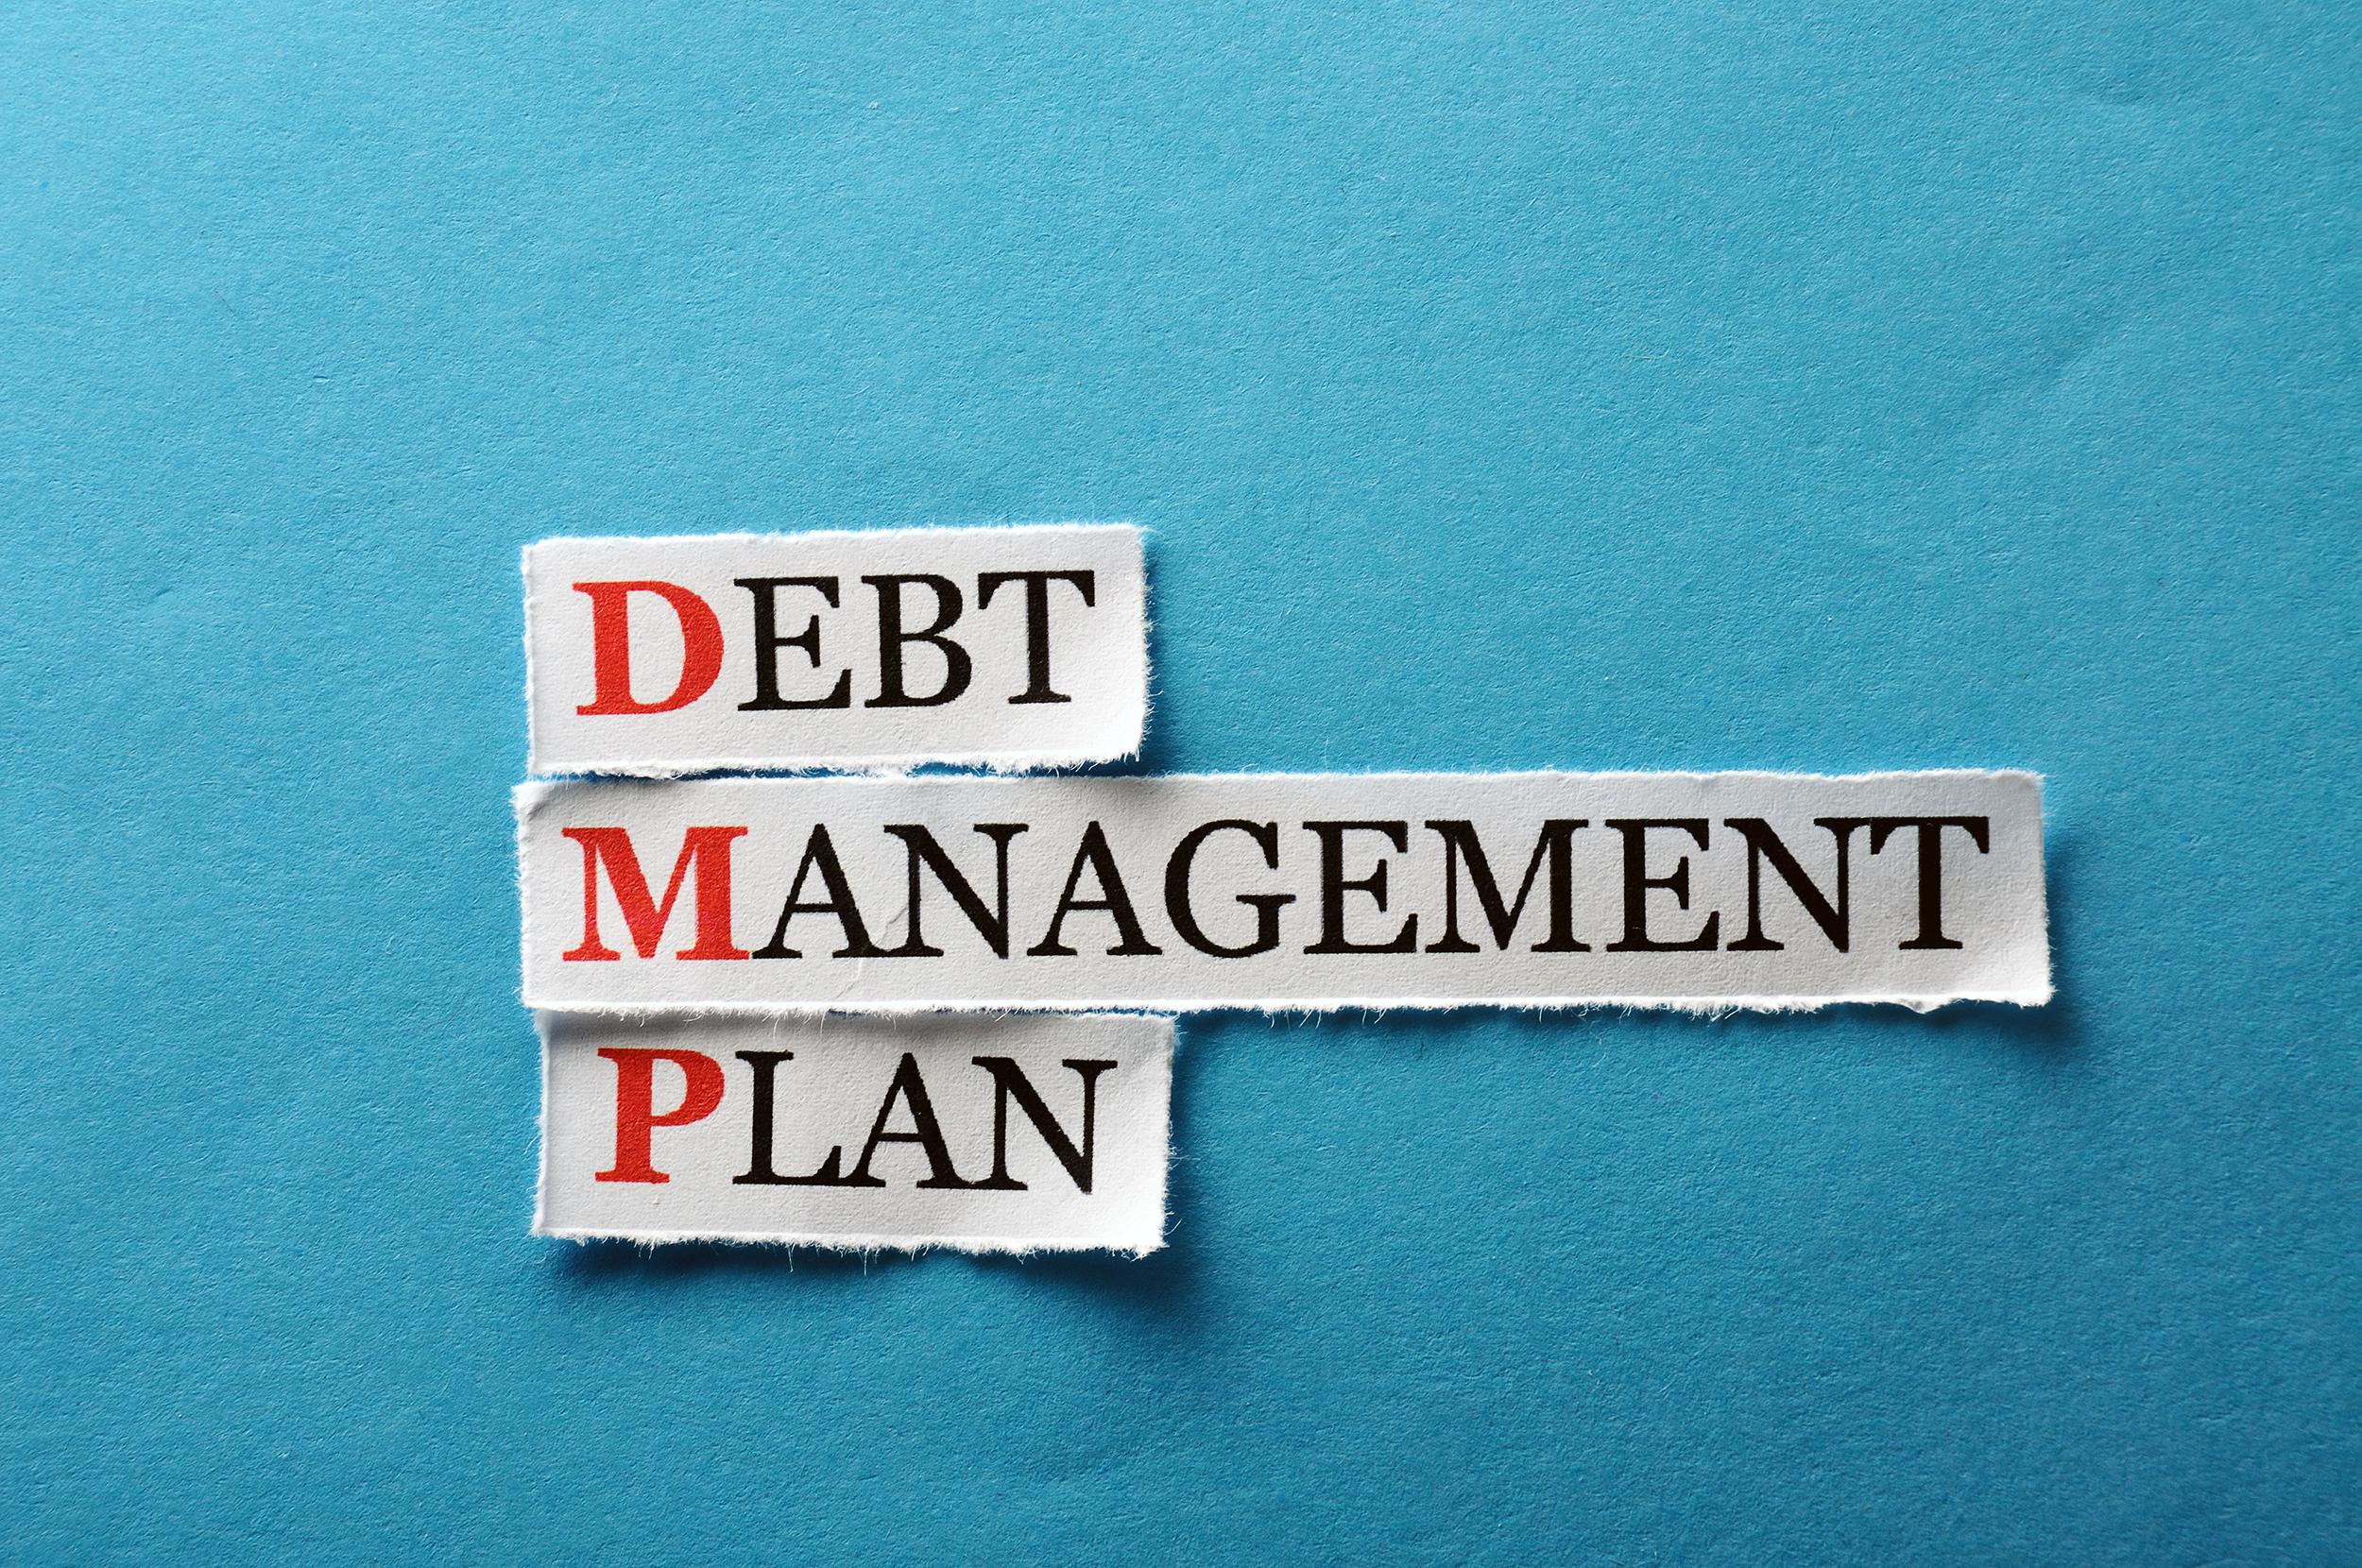 1e81ebd5f22 Considering a Debt Management Plan  Read This - Buddy Loans Blog